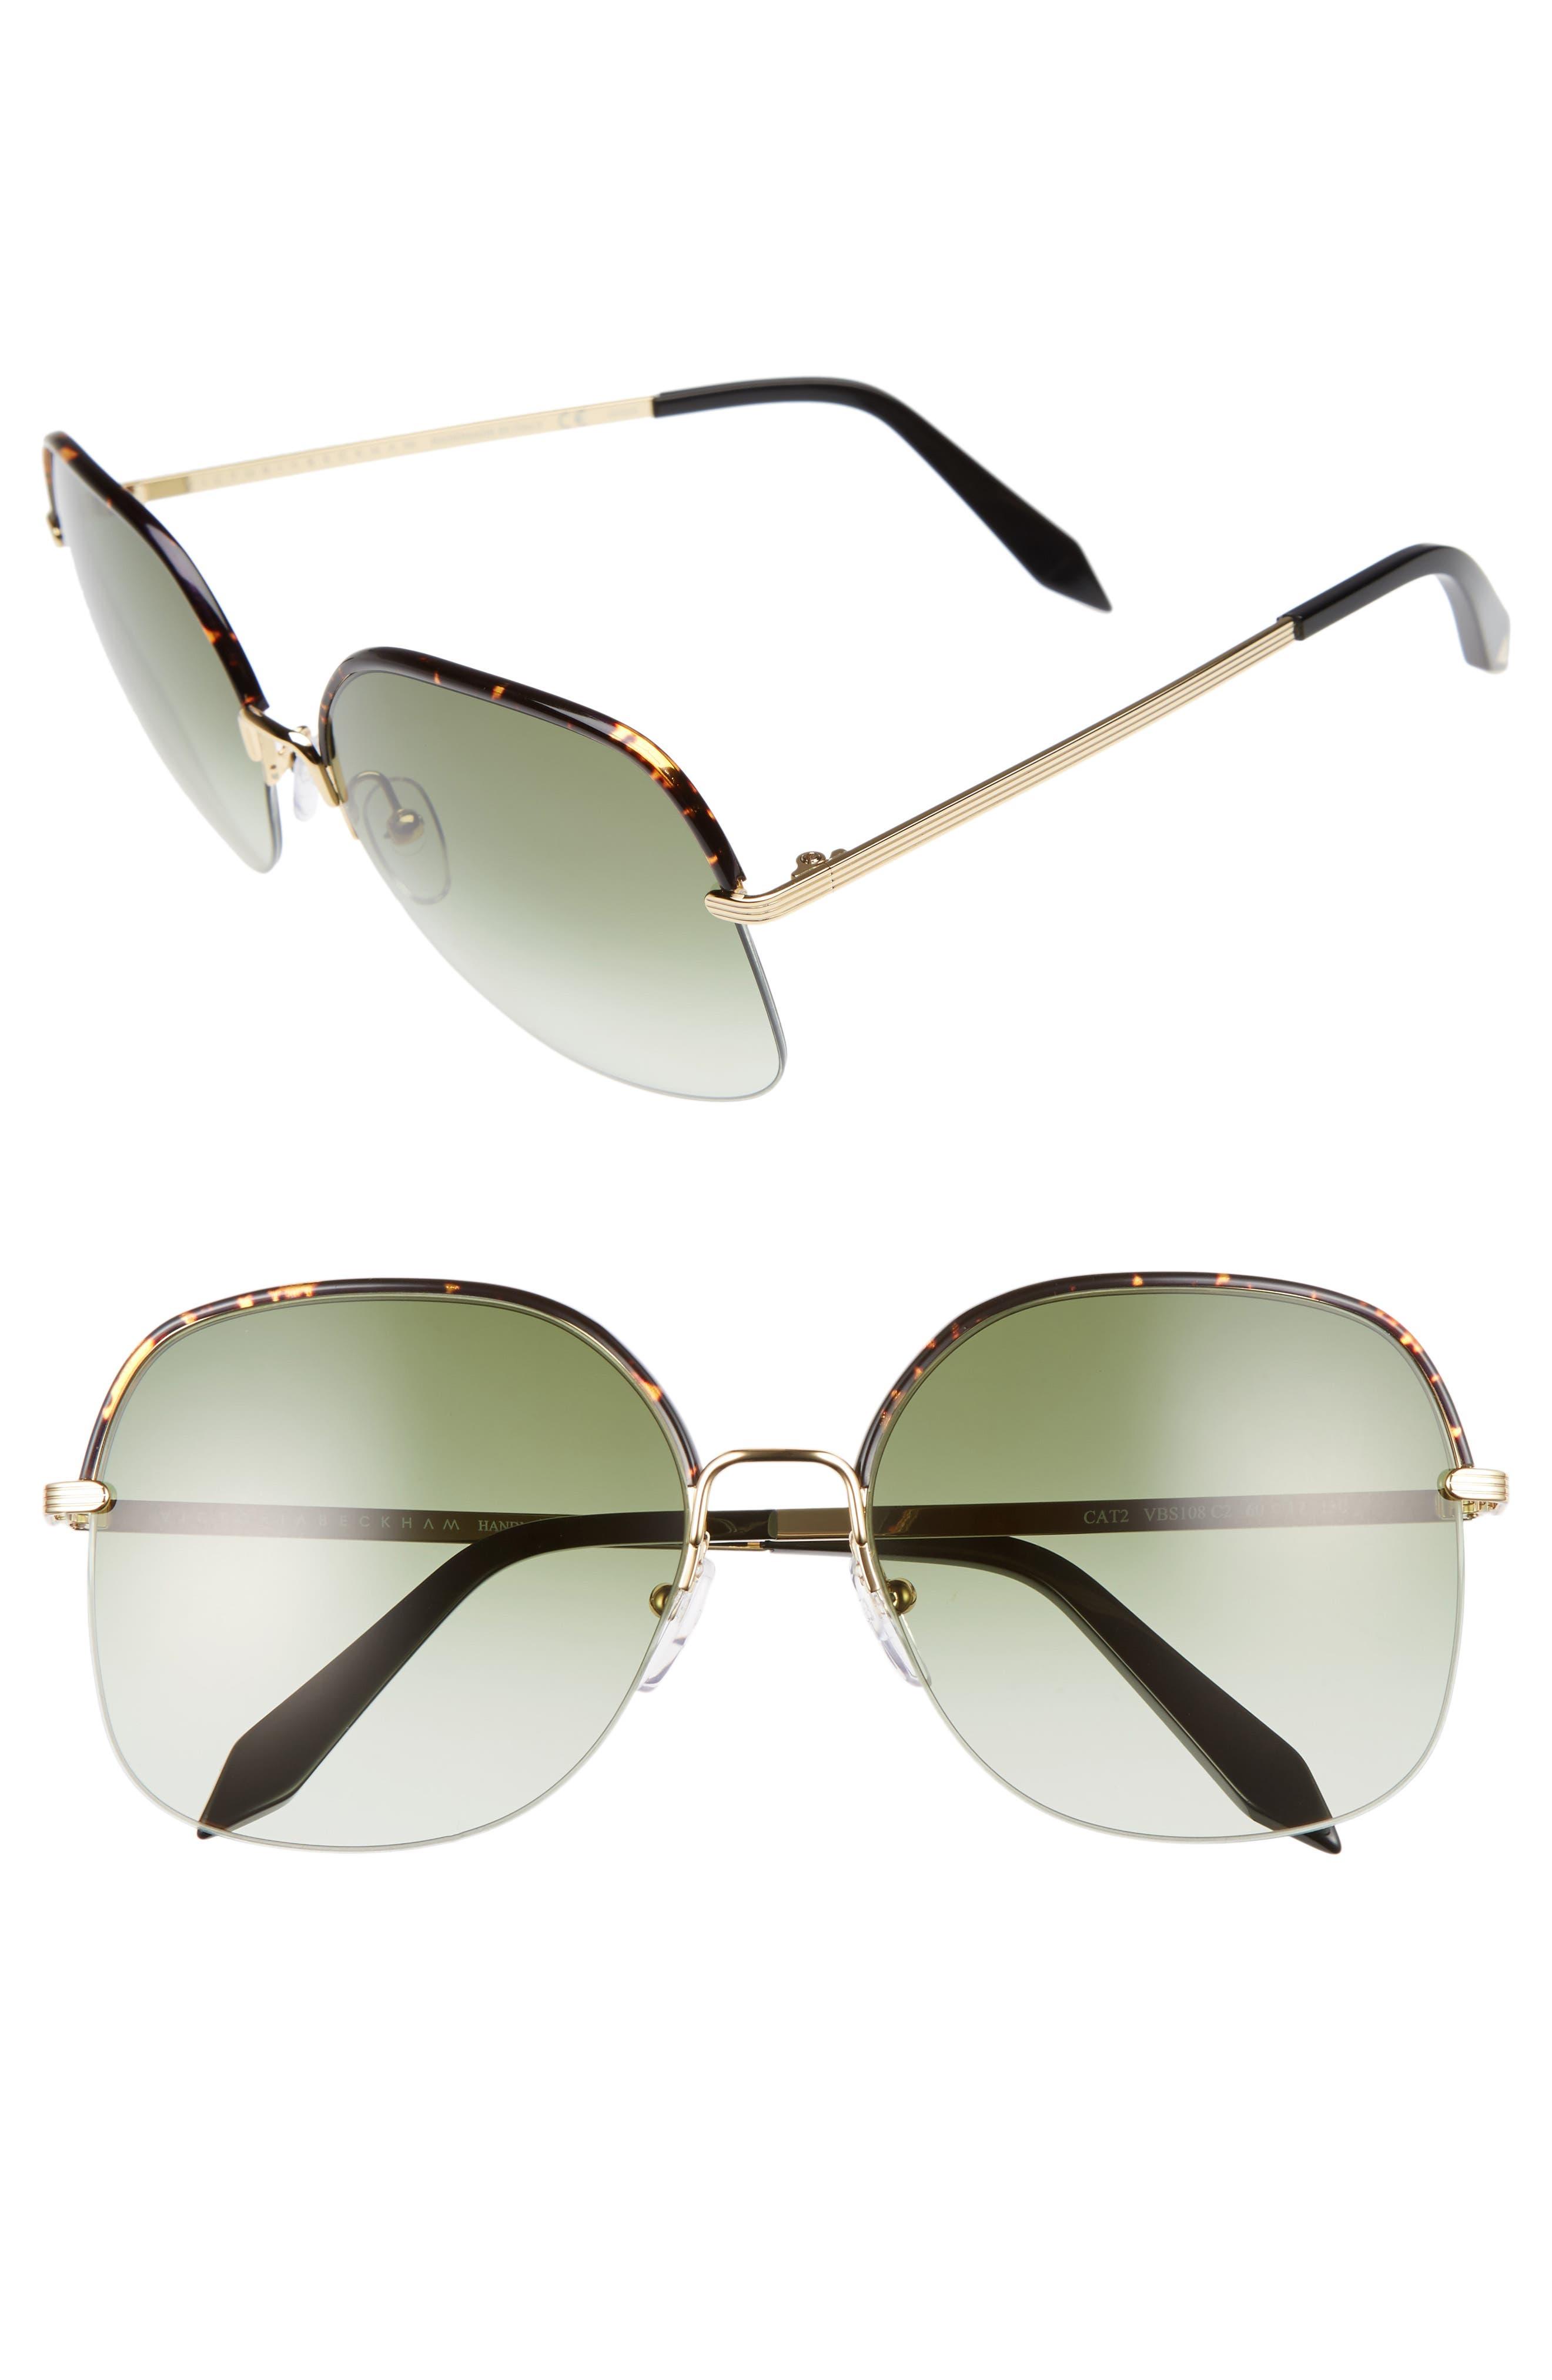 Windsor 60mm Gradient Lens Square Sunglasses,                         Main,                         color, Amber Tortoise